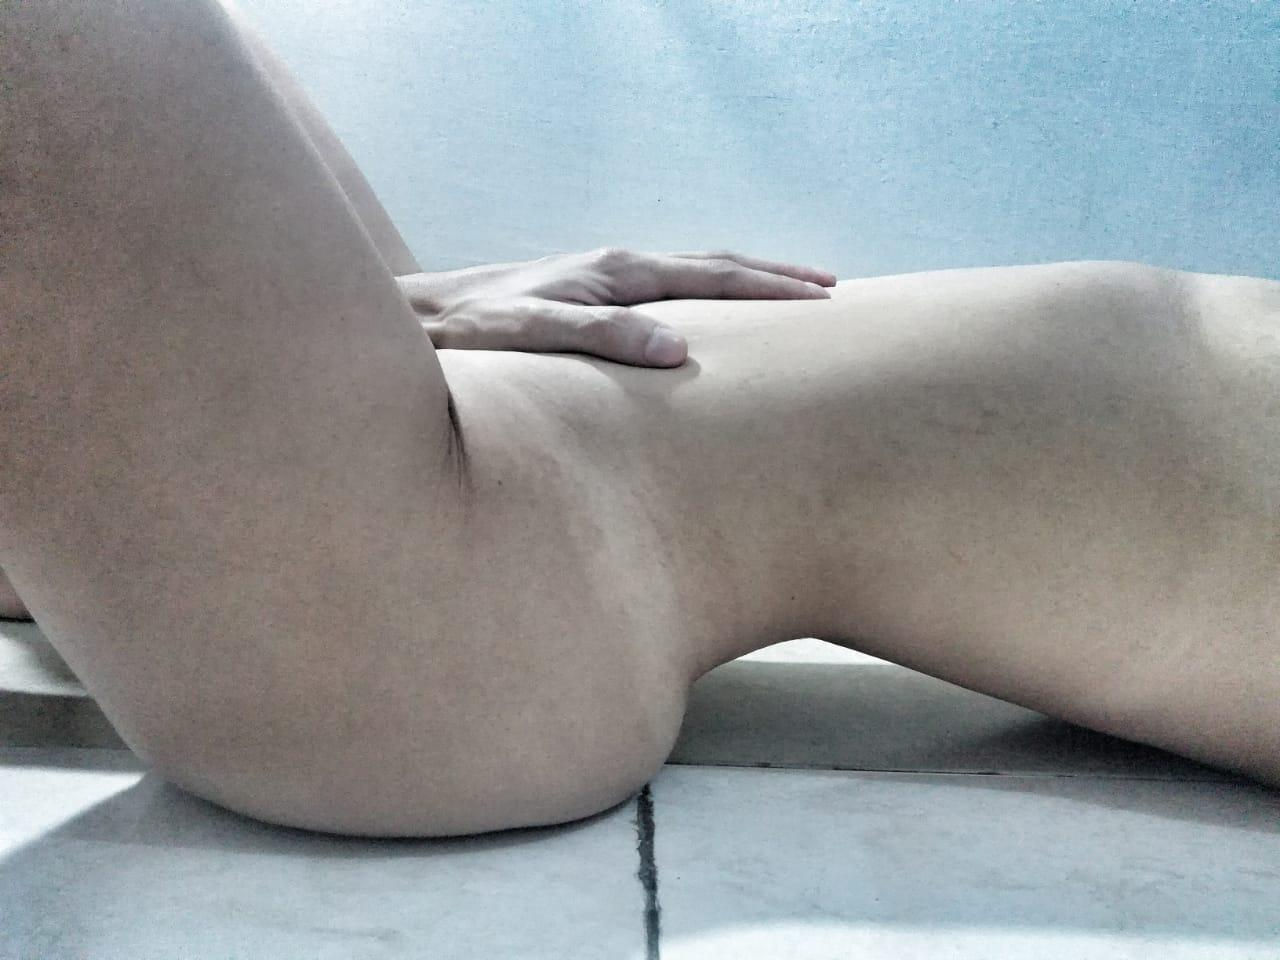 Sex horny?s=uvneobrk4qhlqixi96g+9iylekkeyplpkiukl4uiwxw=